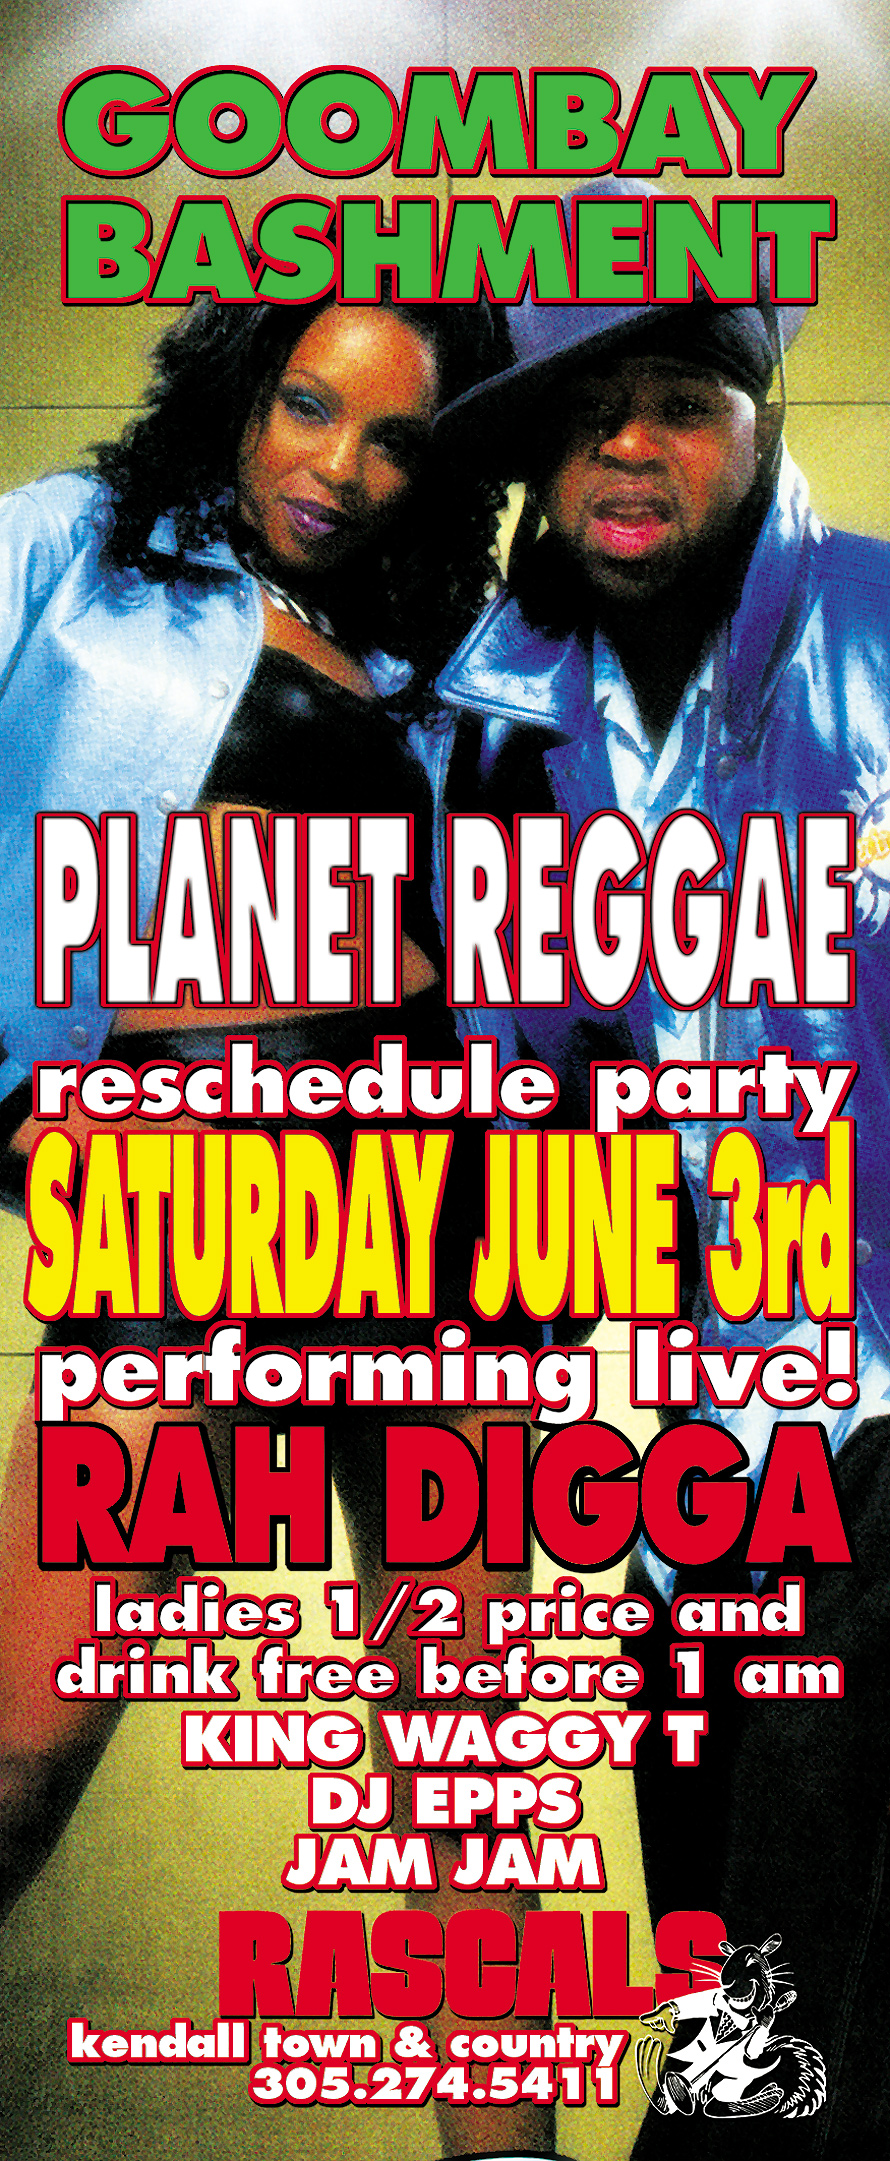 Planet Reggae Goombay Bashment